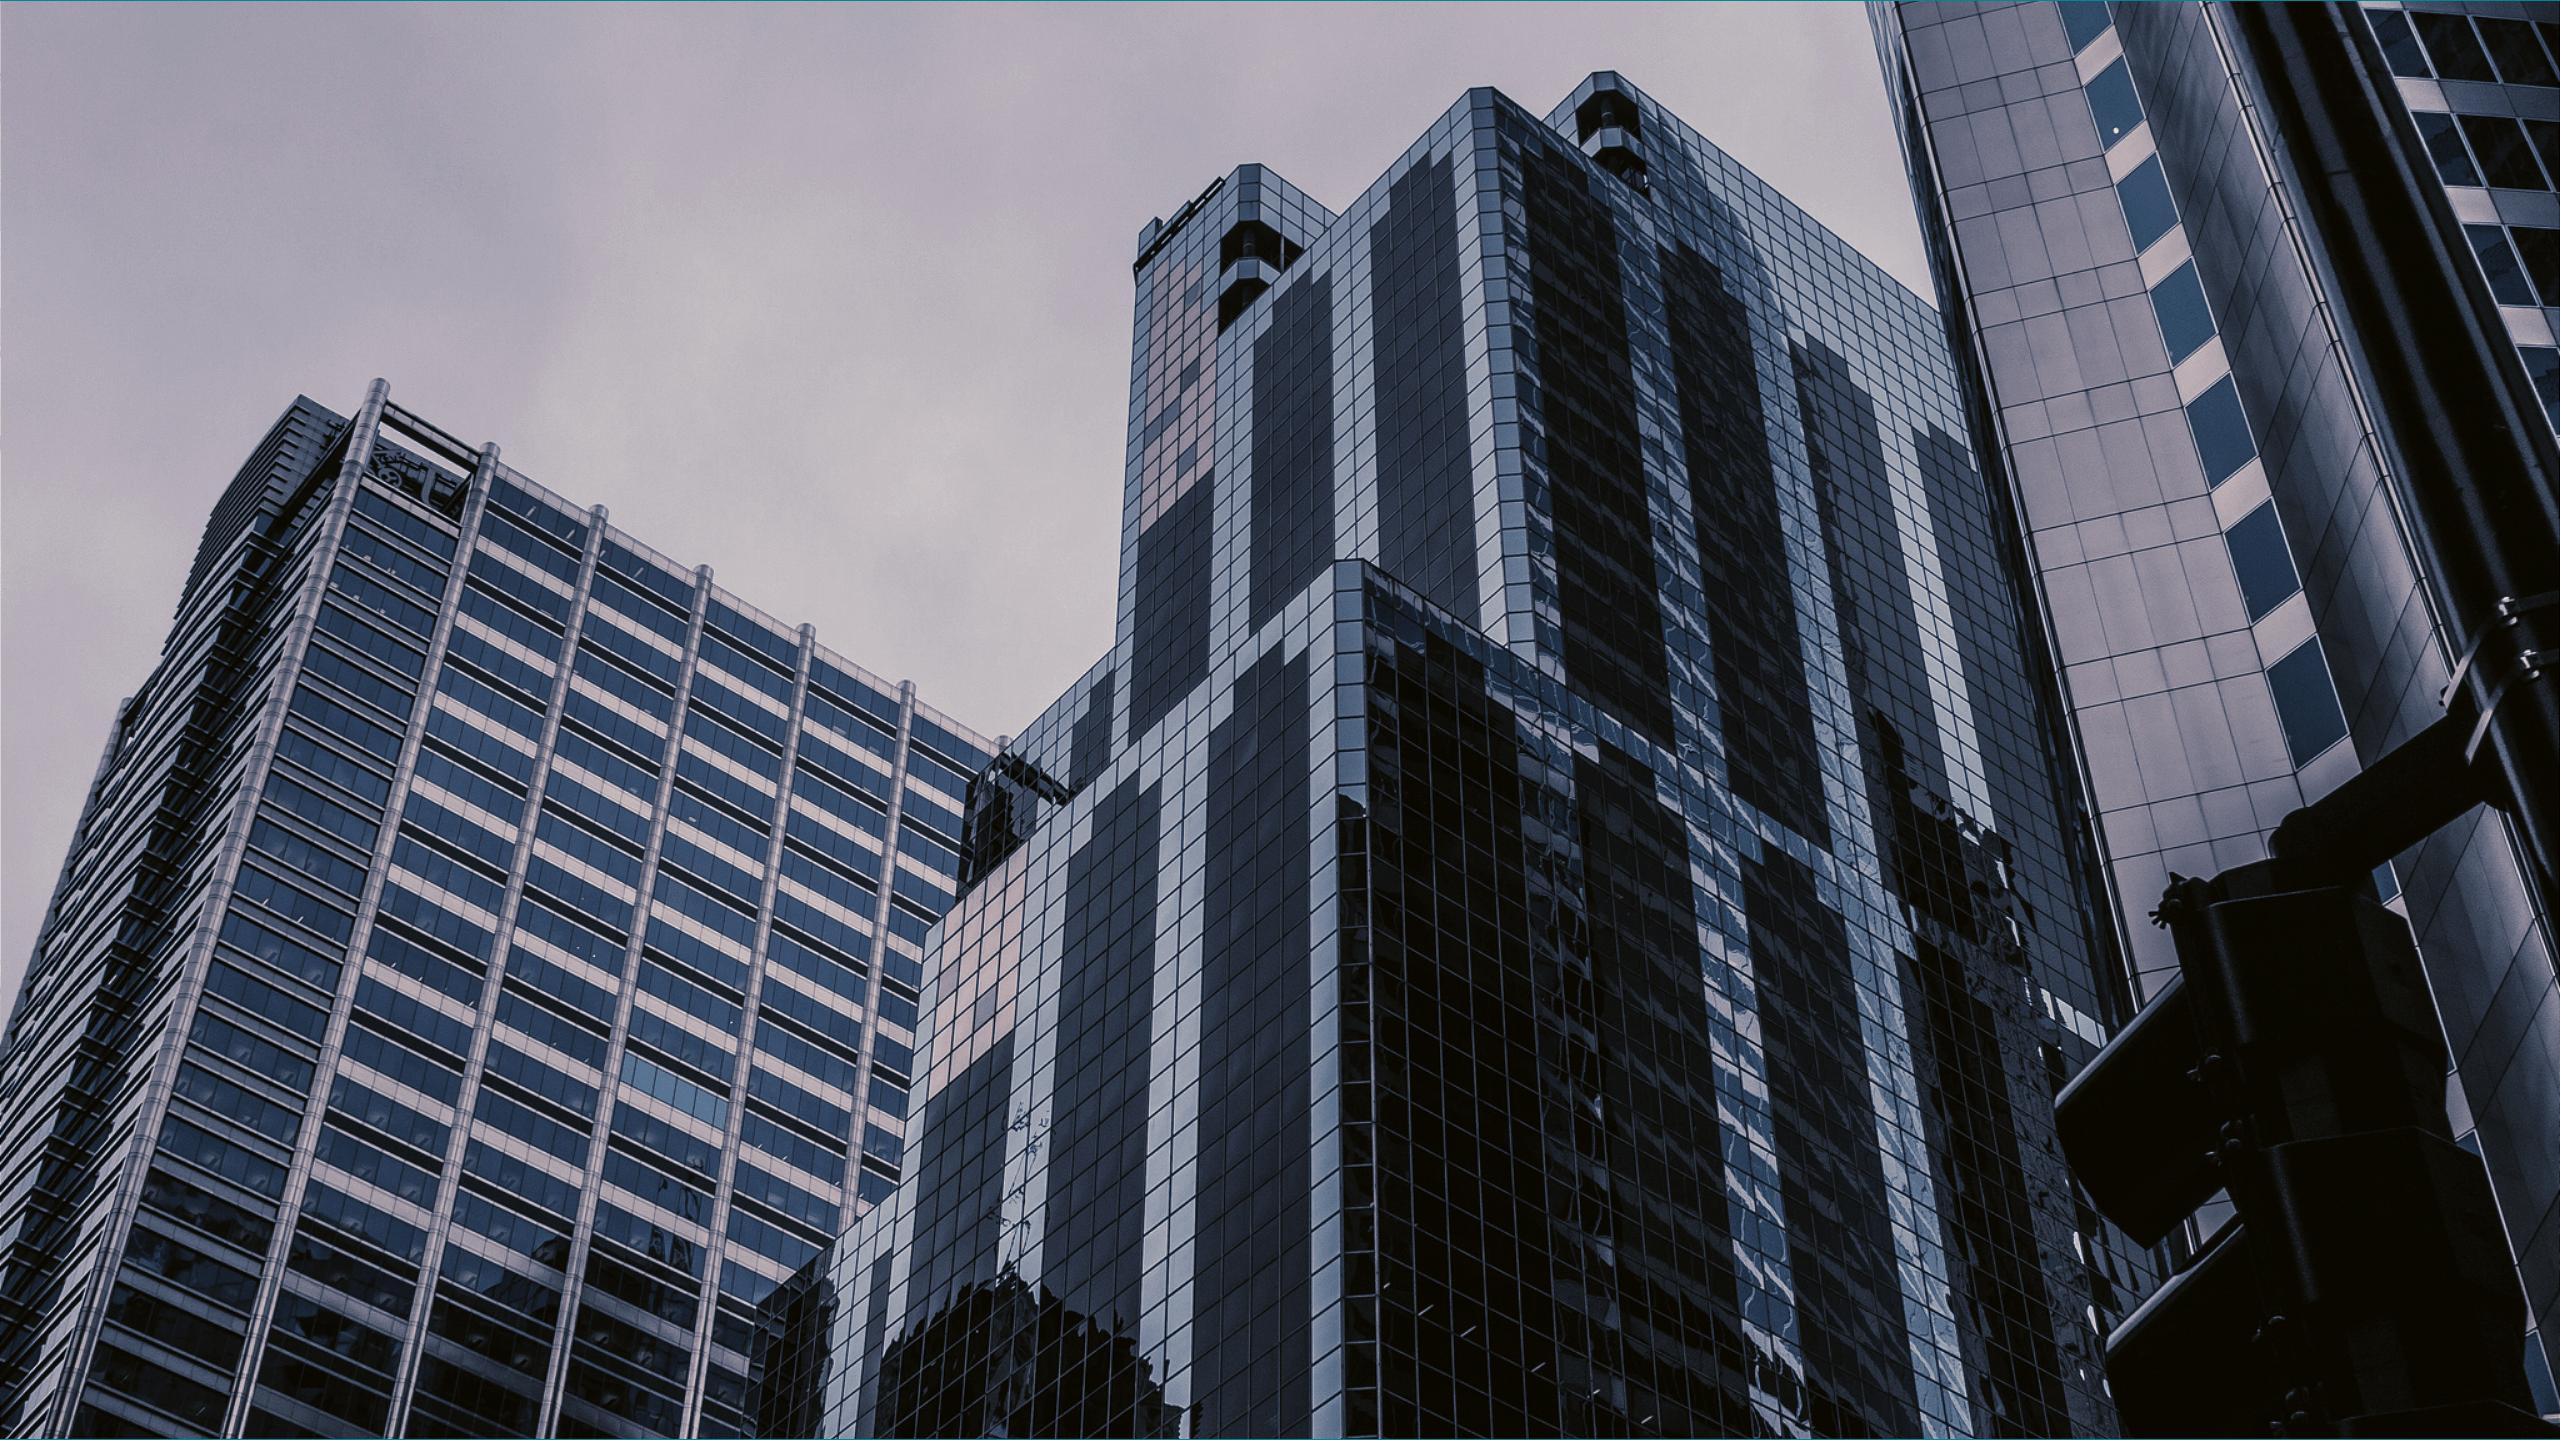 Building,                Skyscraper,                Metropolitan,                Area,                Metropolis,                Commercial,                Condominium,                Tower,                Block,                Daytime,                City,                Urban,                Headquarters,                 Free Image